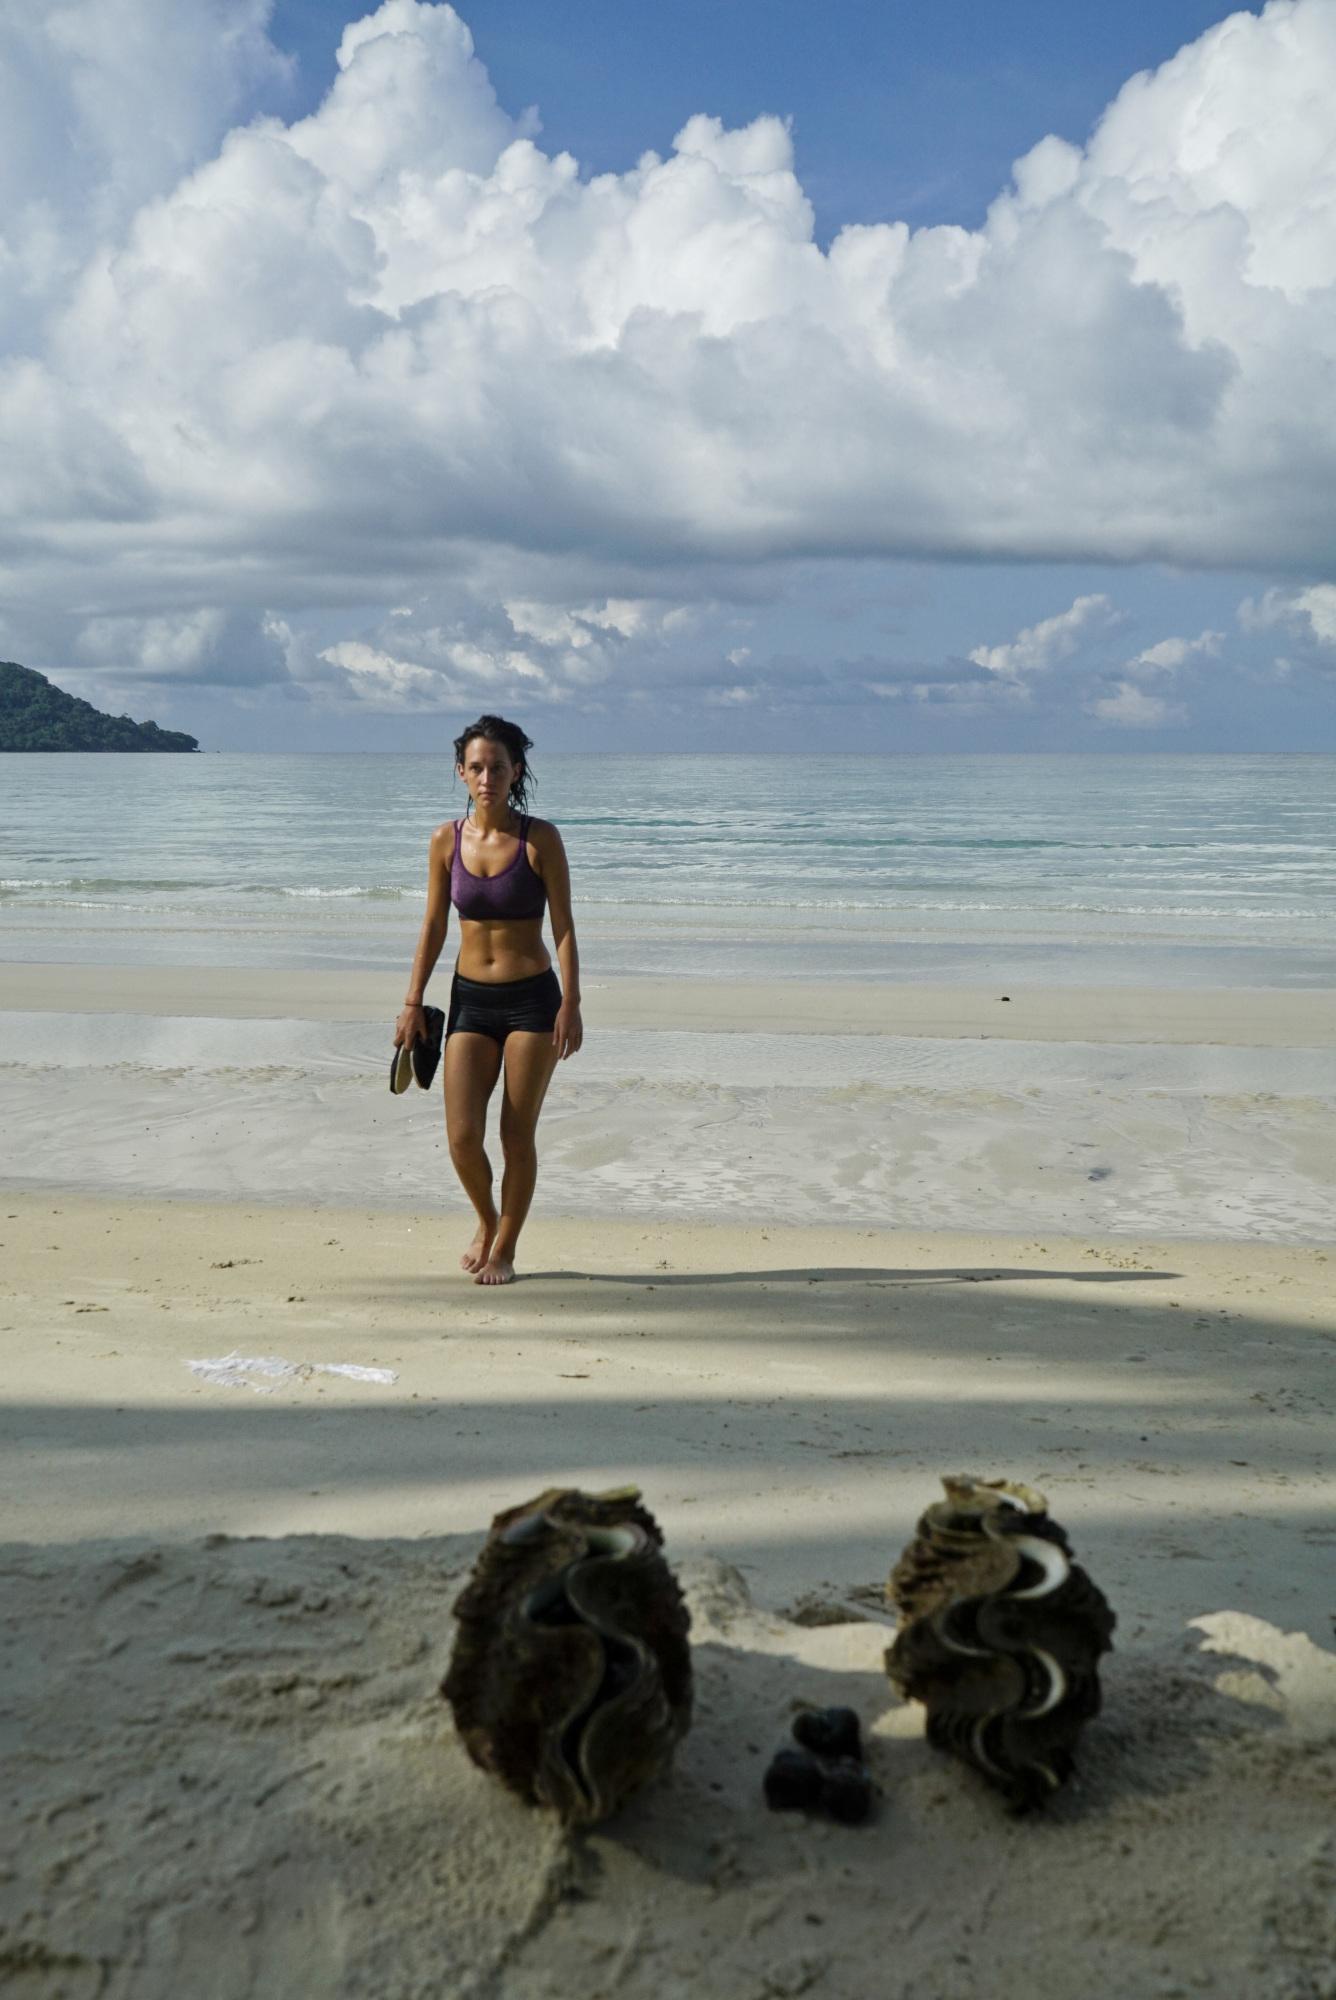 Ciera Eastin on Survivor: Second Chance